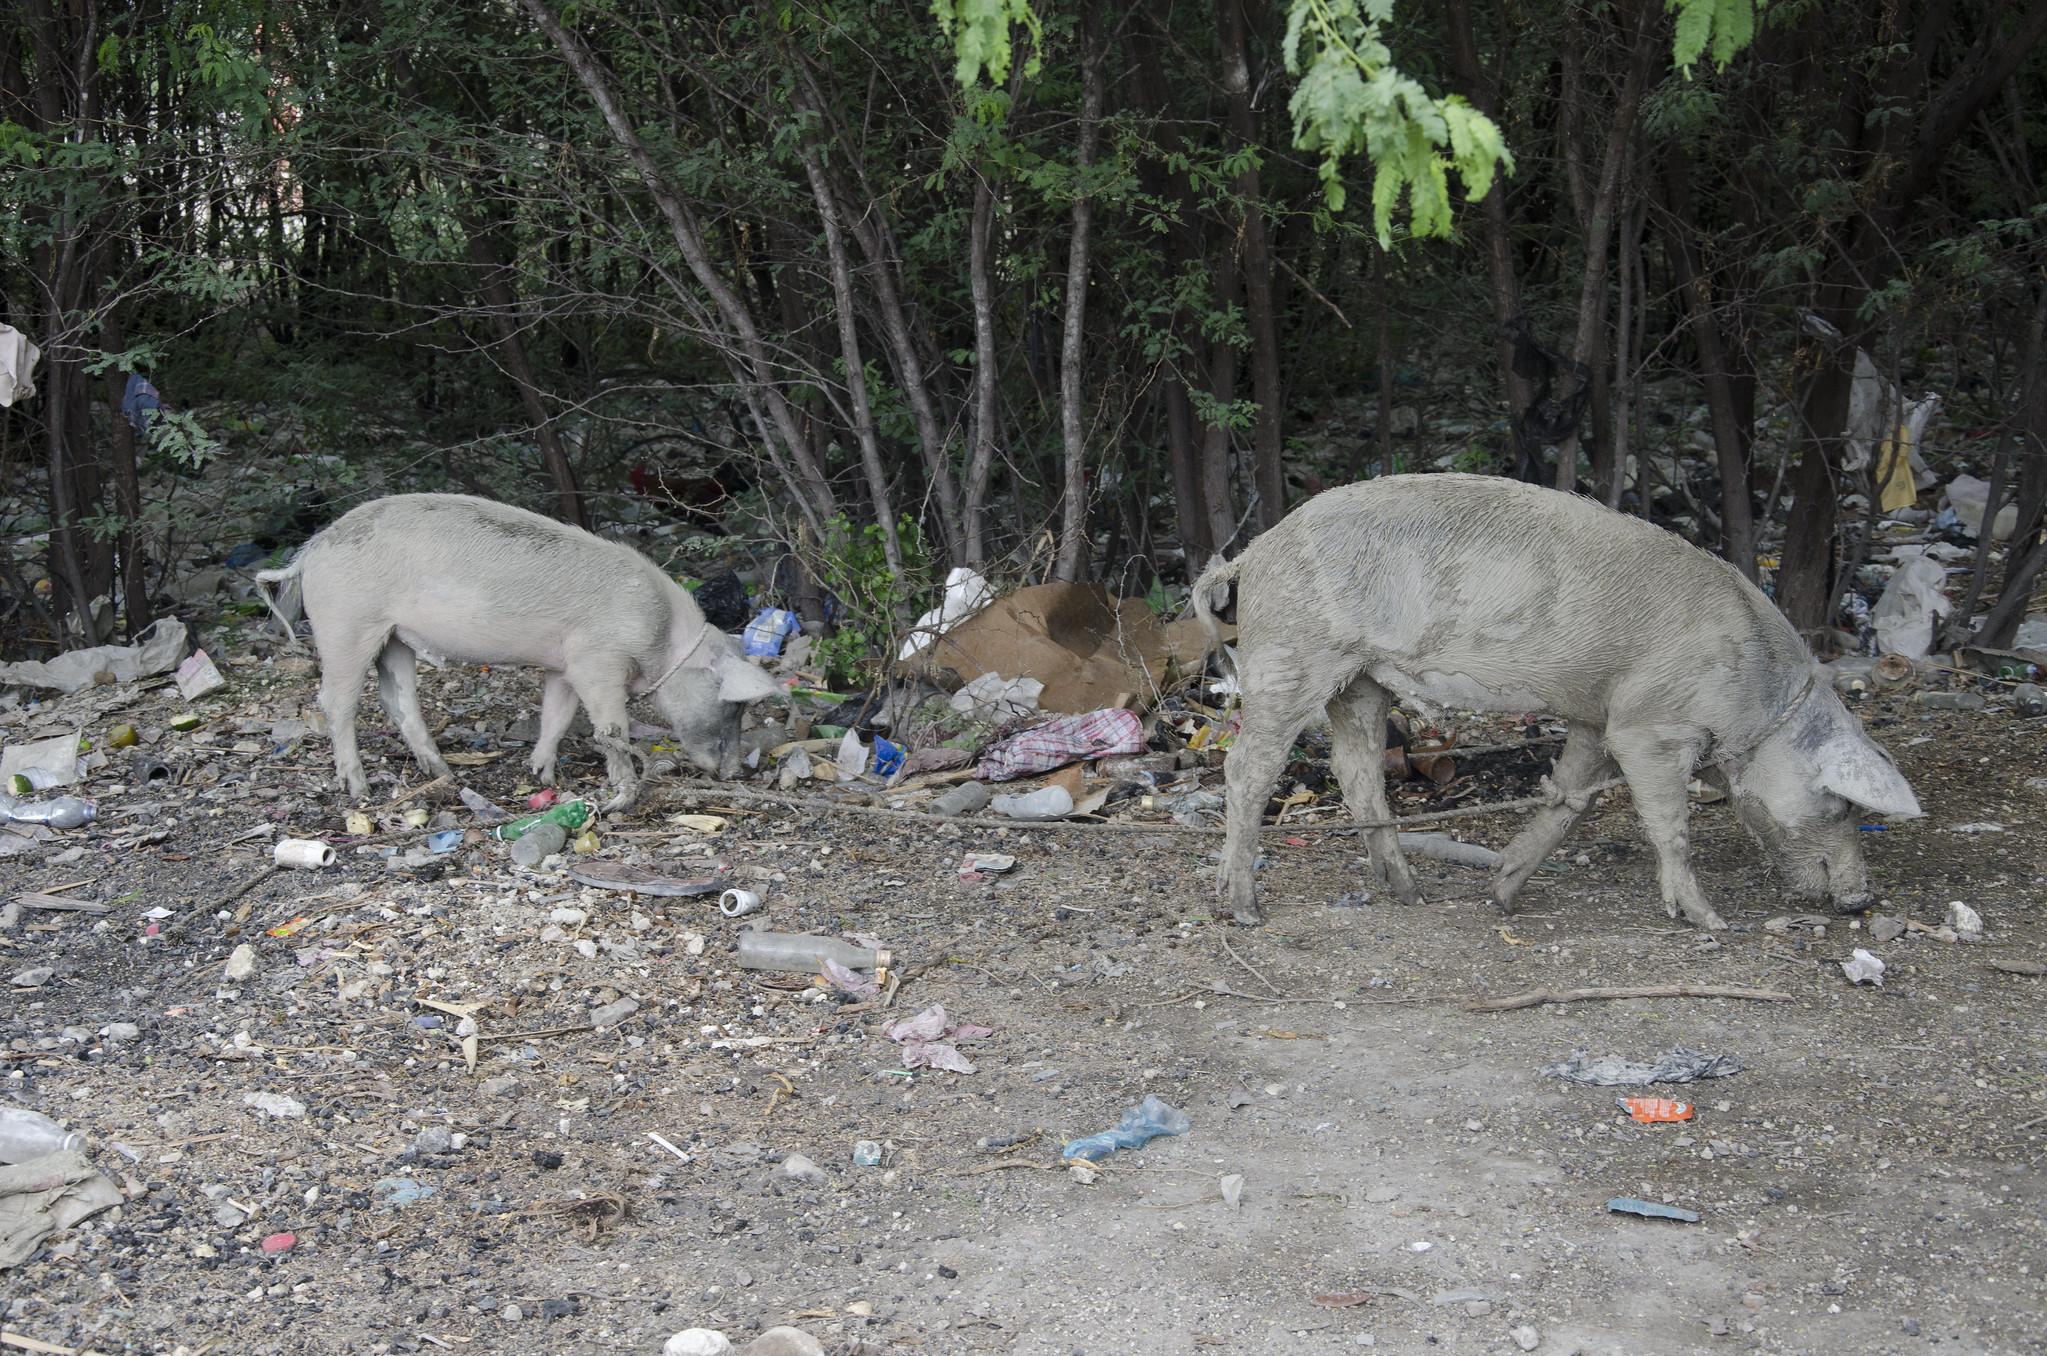 Haitian pig